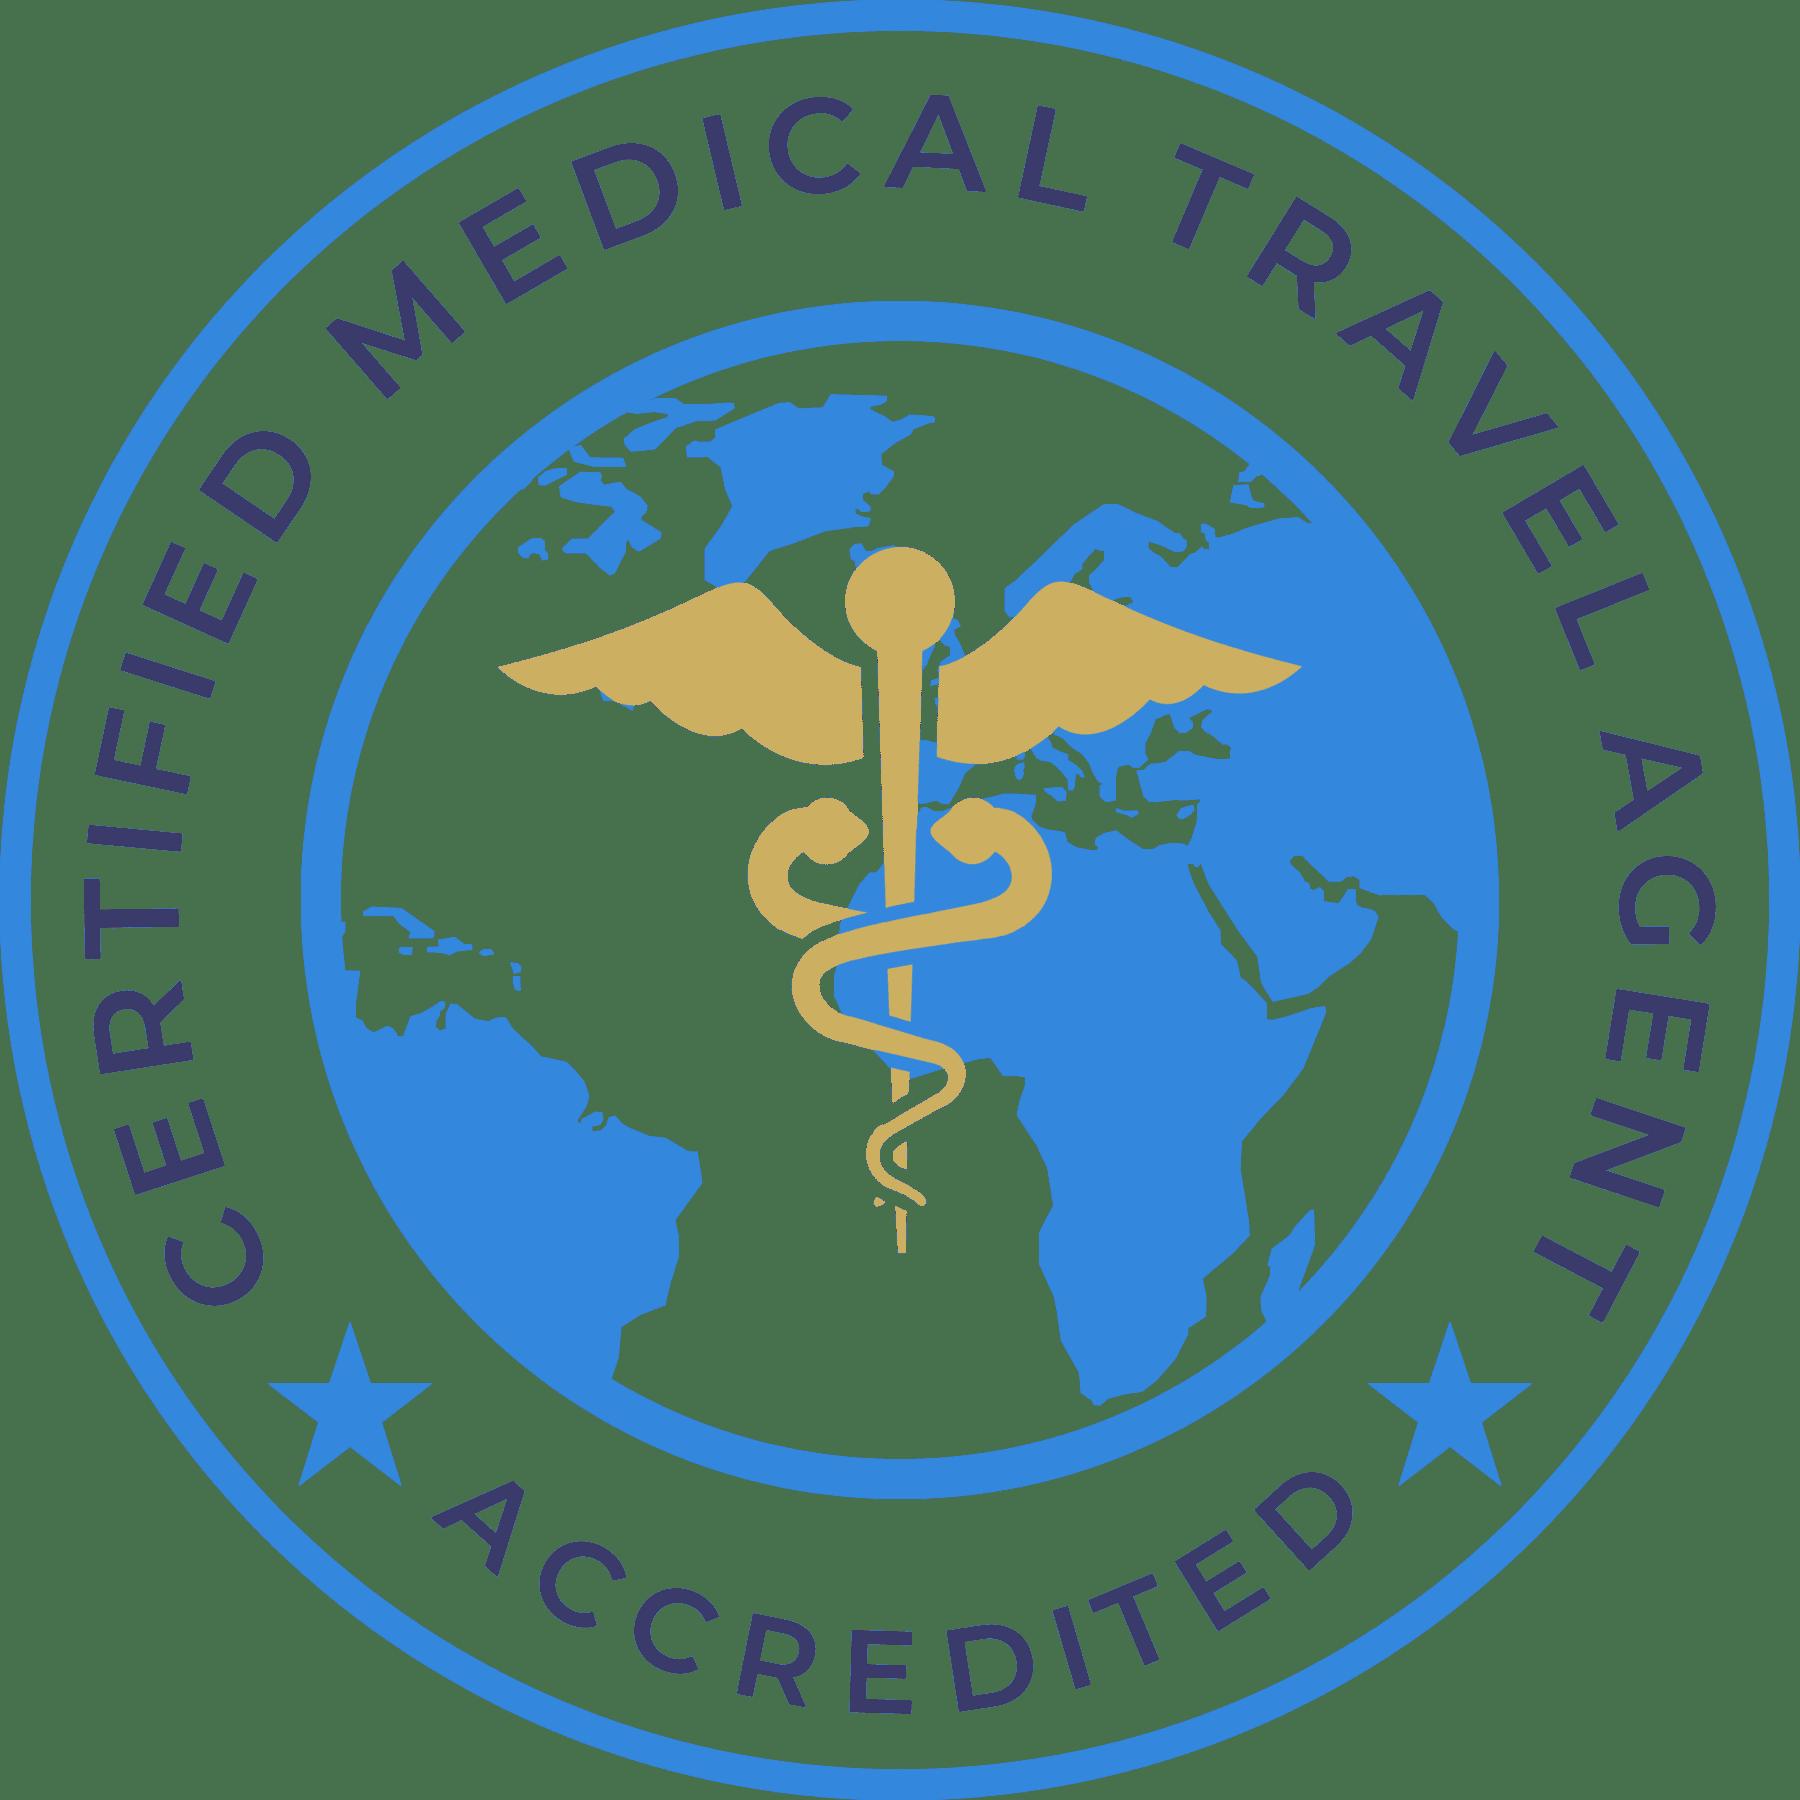 CERTIFIED MEDICAL TRAVEL AGENT LOGO (CMTA)